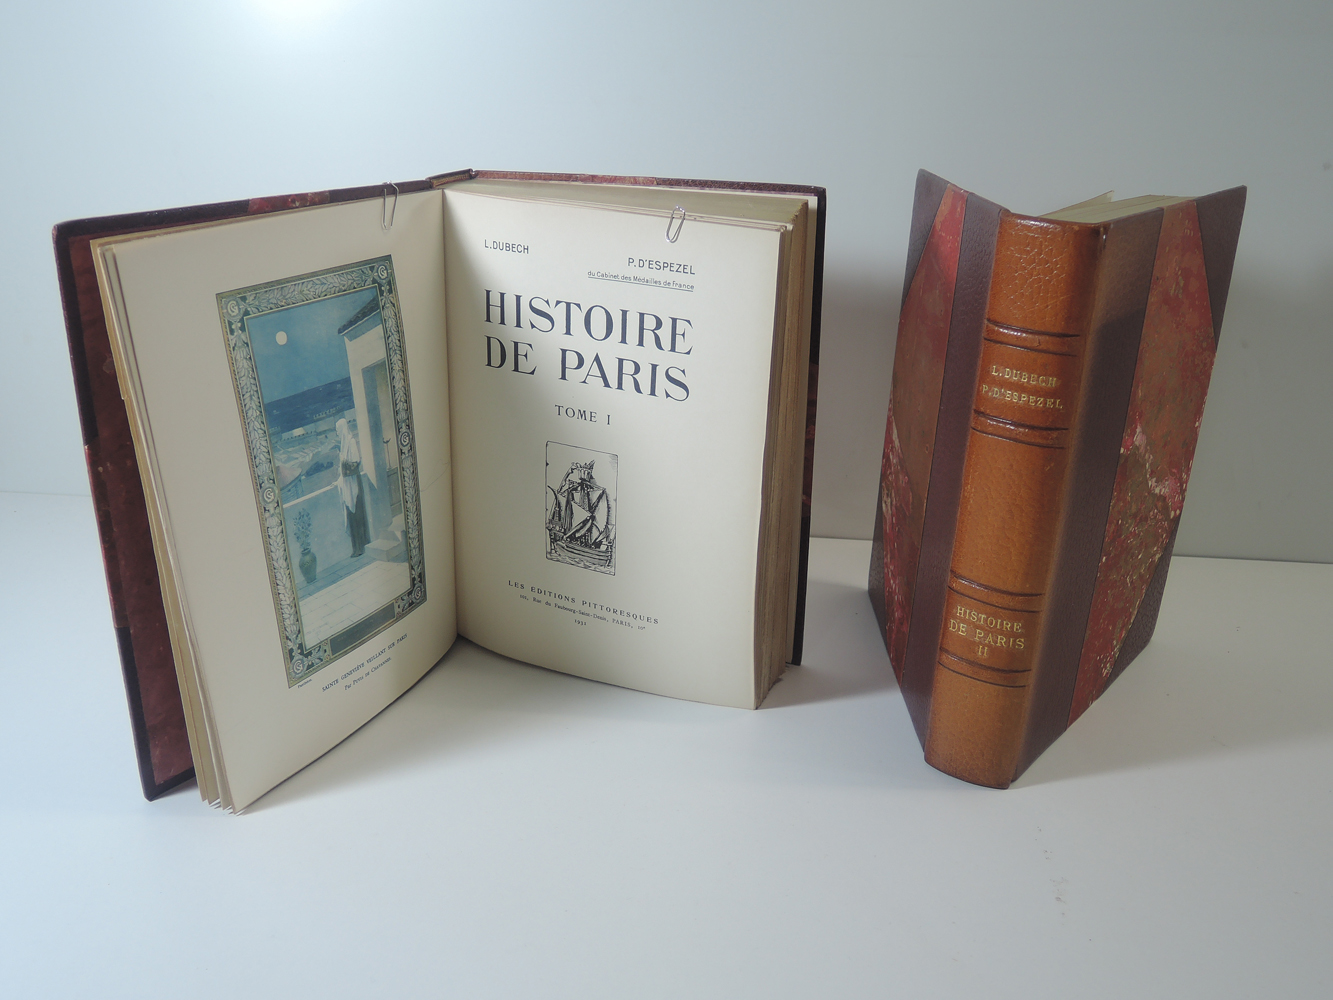 l-dubech-p-d-espezel-histoire-de-paris-les-editions-pittoresques-1931--5